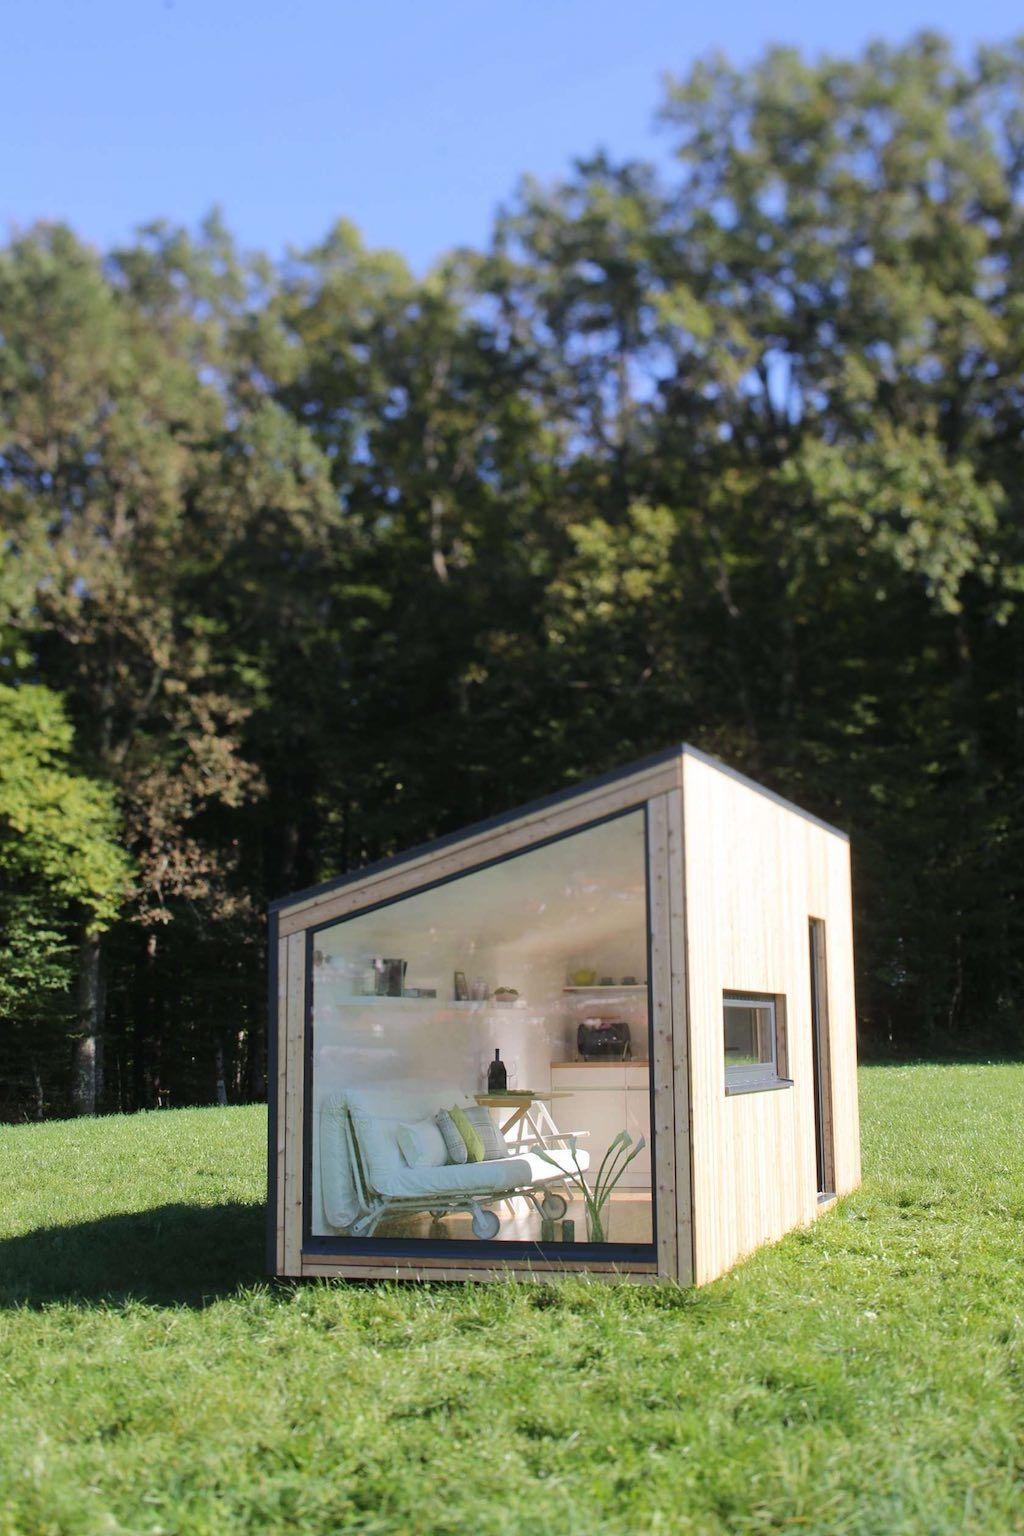 Mini For 2 Tiny House Design Small House Design Tiny House Swoon Mini house for backyard